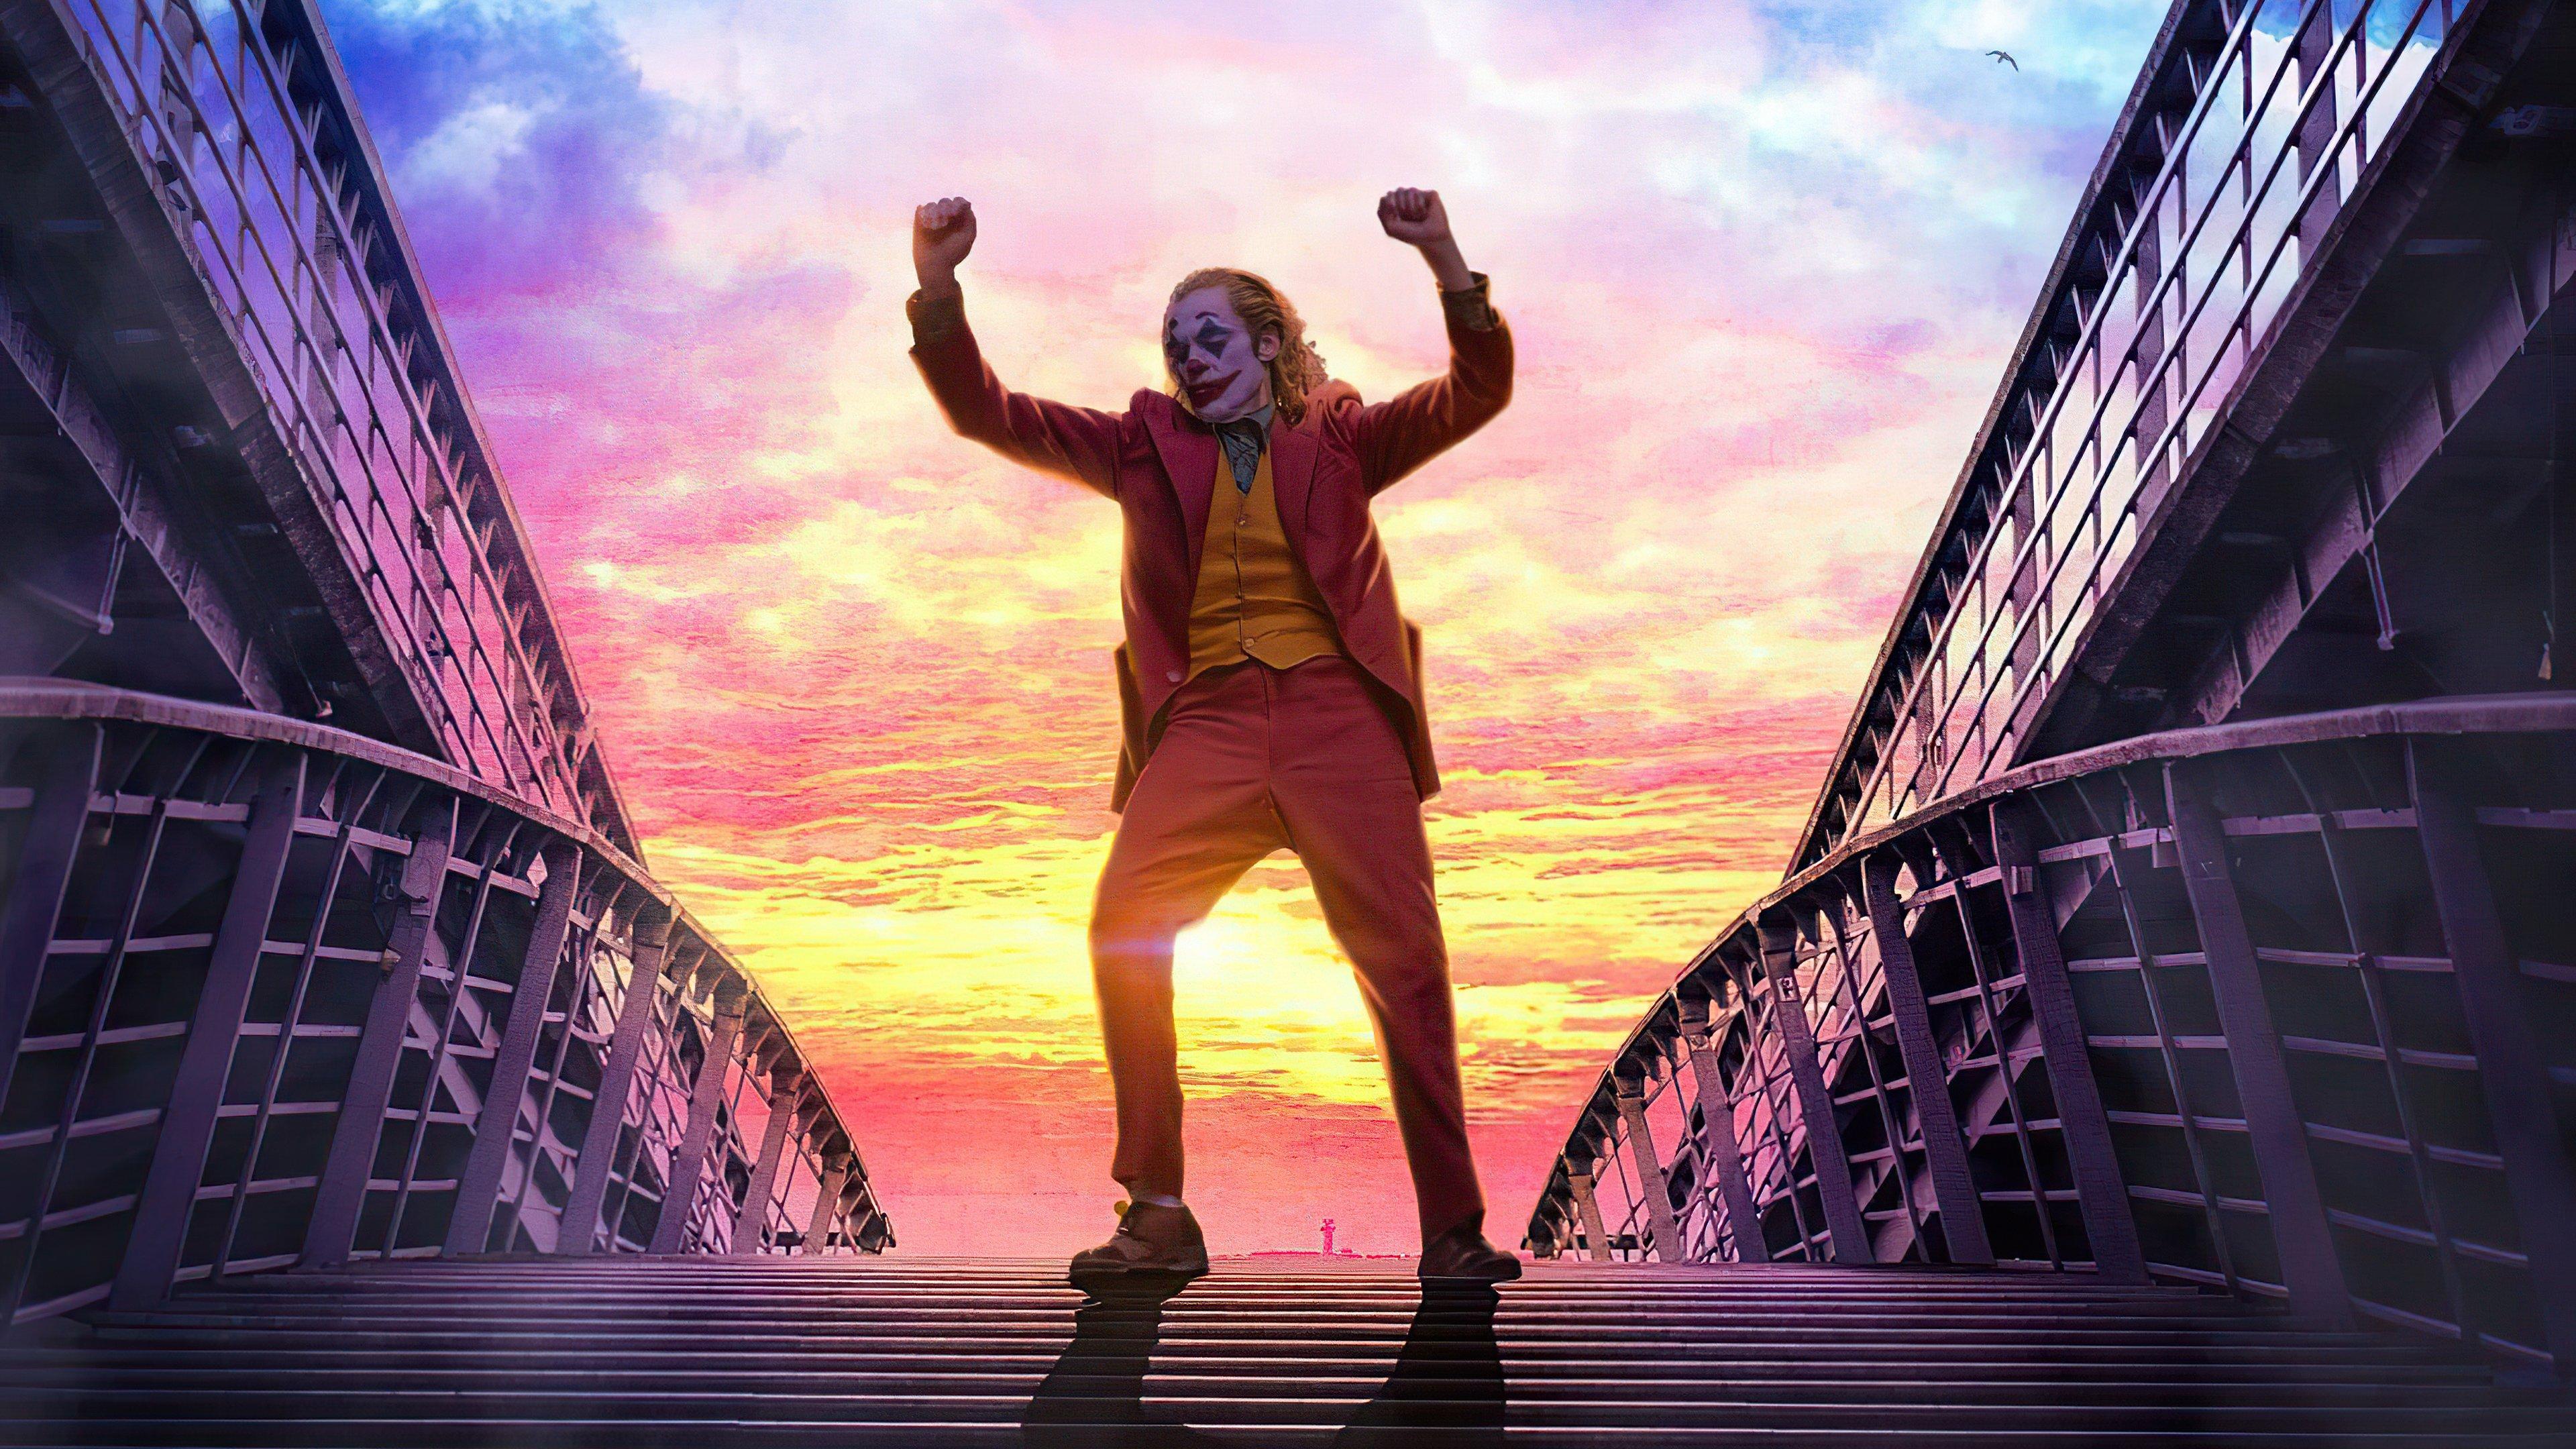 Wallpaper Joker dancing in the stairs